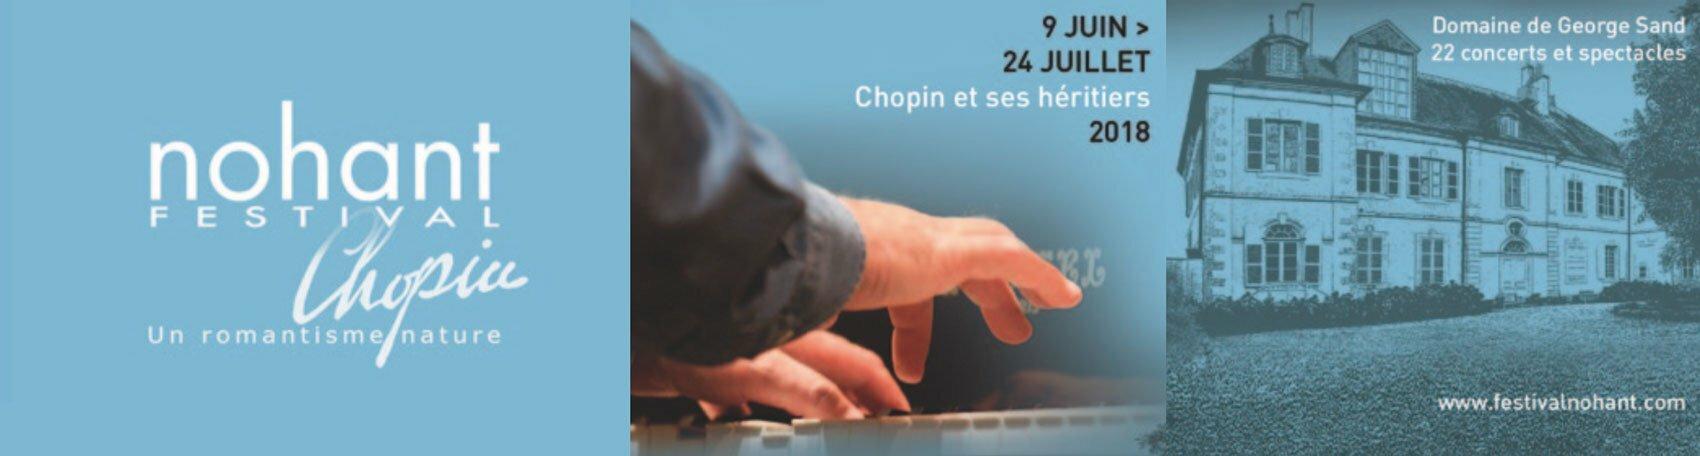 bandeau-Saison-2018-Nohant-Festival-Chopin